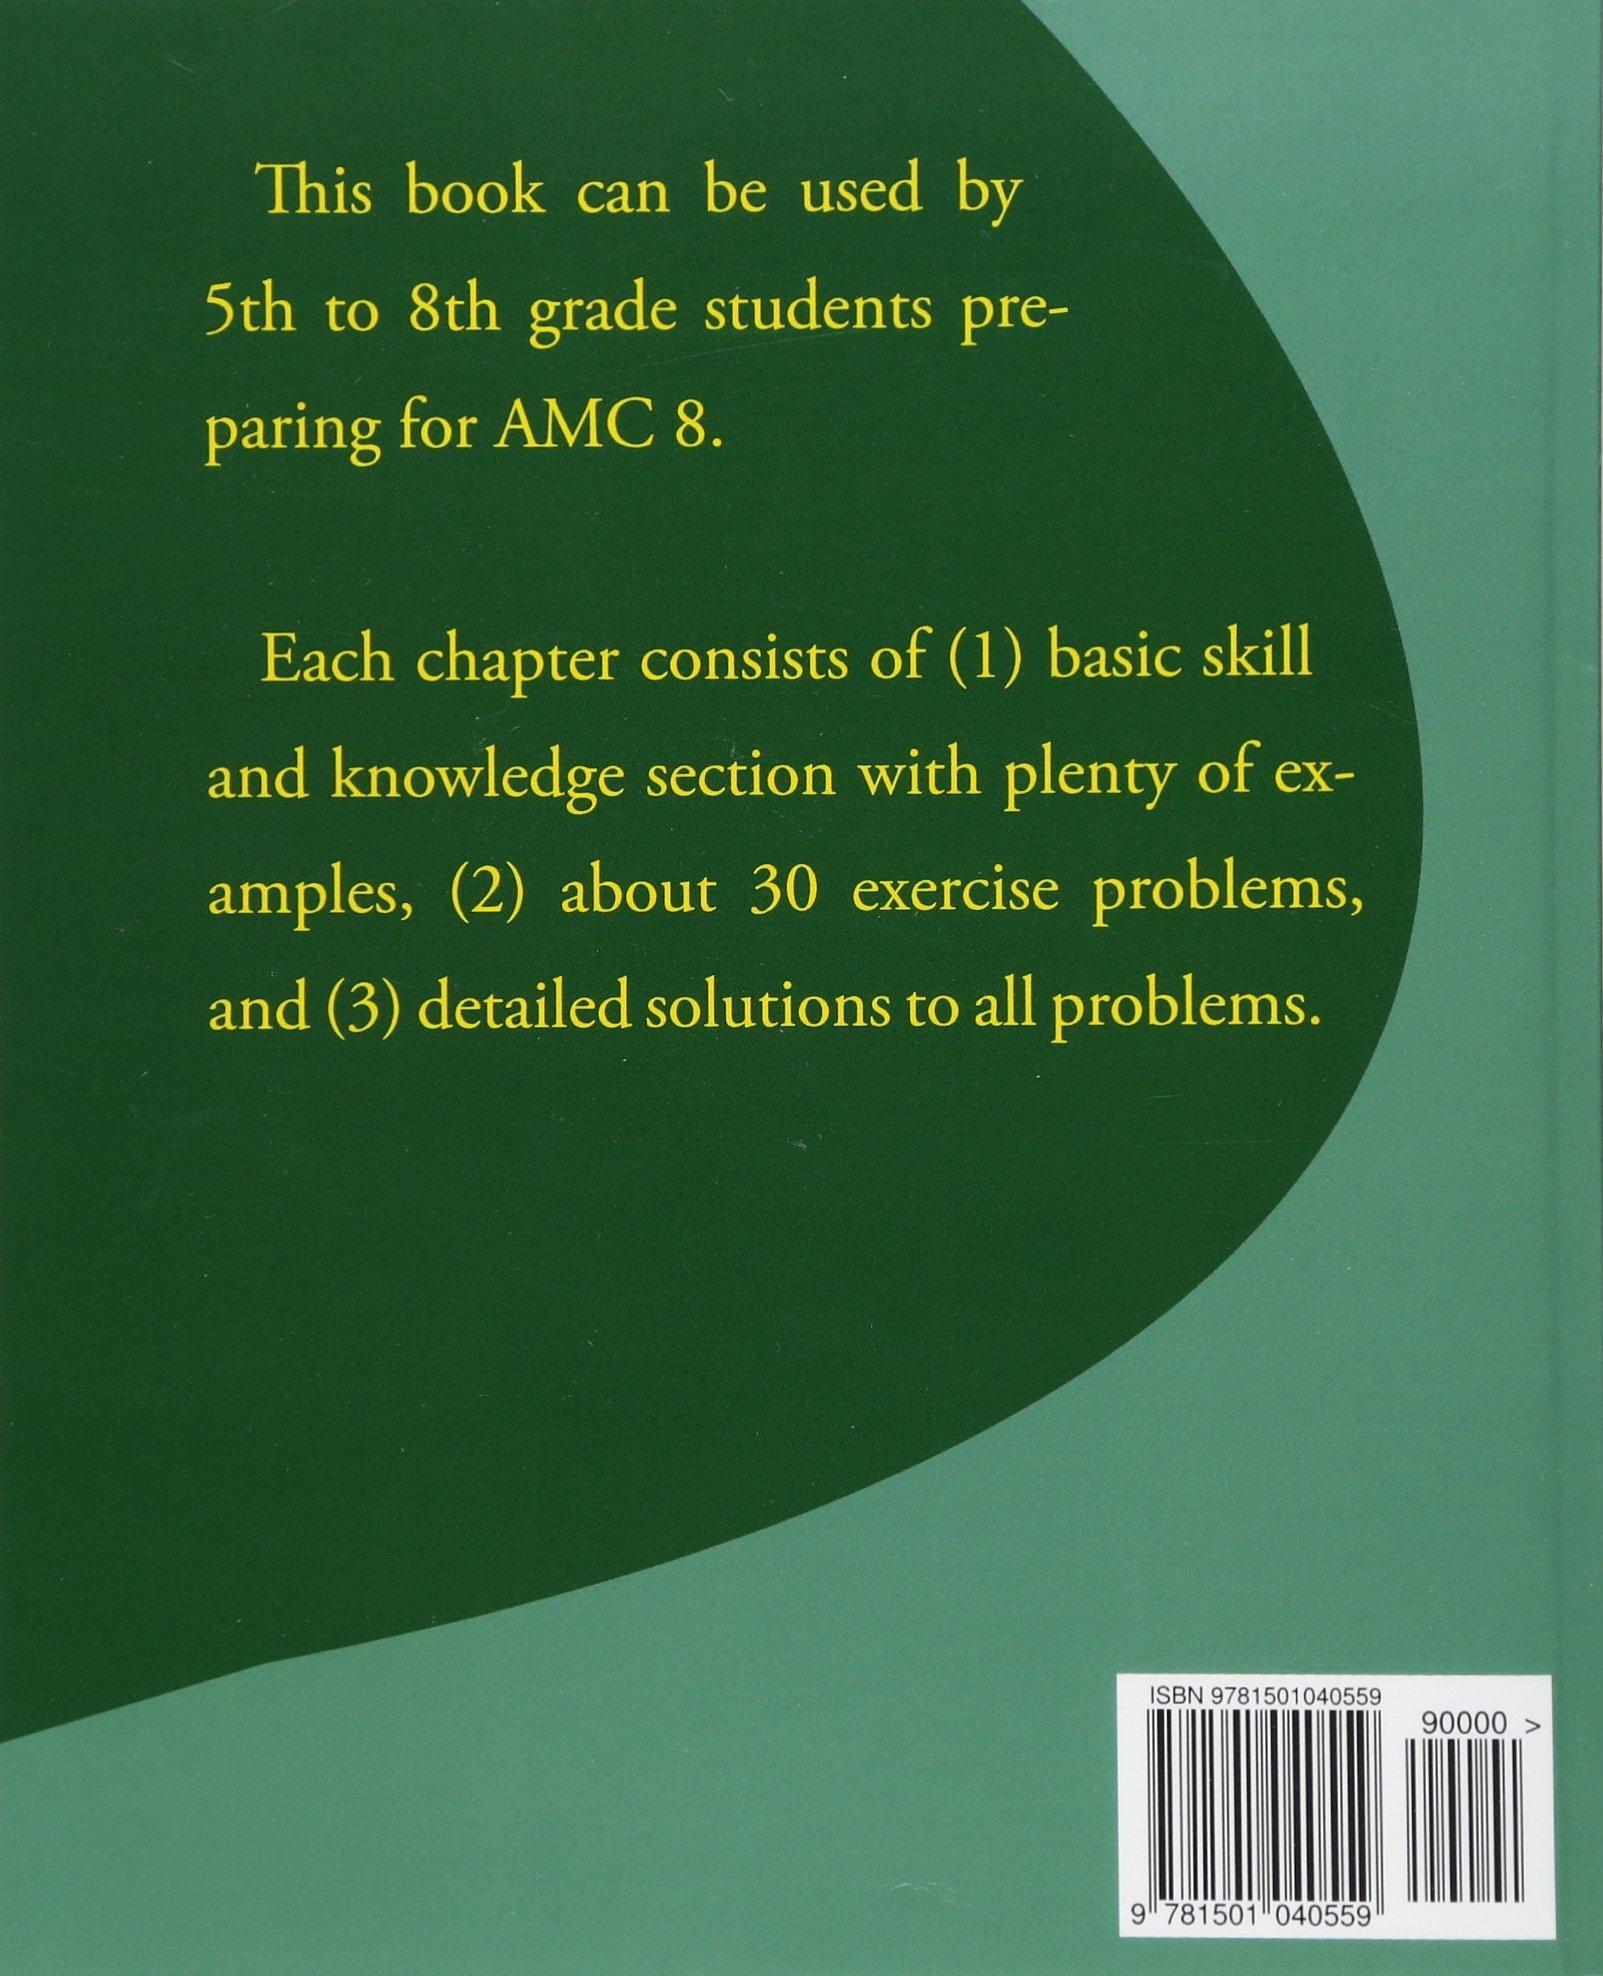 Amazon.com: American Mathematics Competitions (AMC 8) Preparation (Volume  3) (9781501040559): Sam Chen, Yongcheng Chen: Books